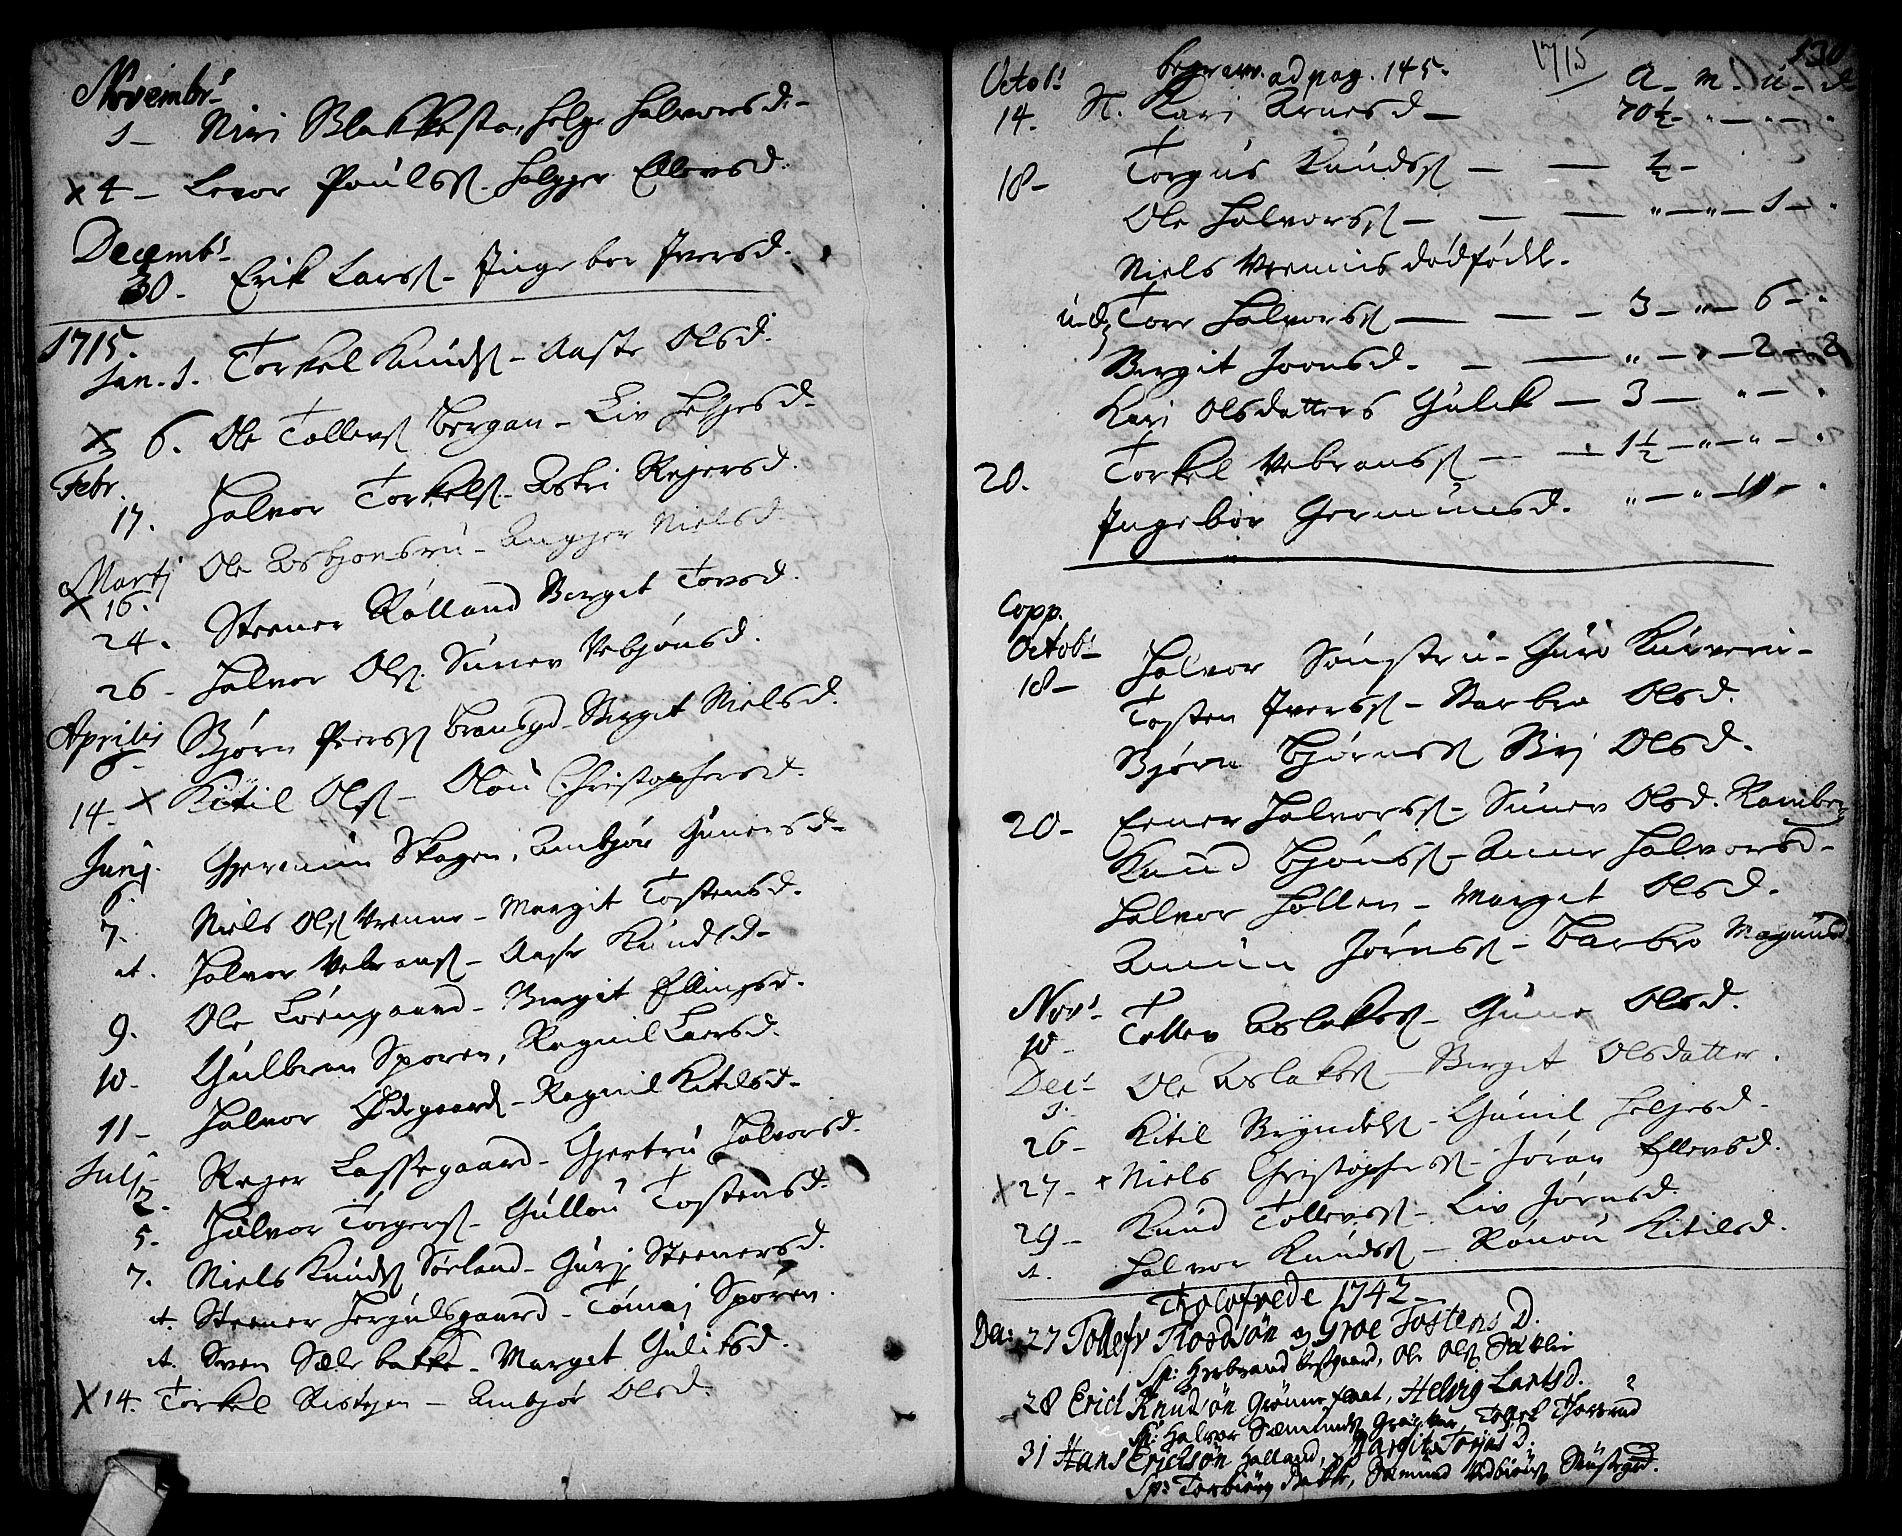 SAKO, Rollag kirkebøker, F/Fa/L0002: Ministerialbok nr. I 2, 1714-1742, s. 130